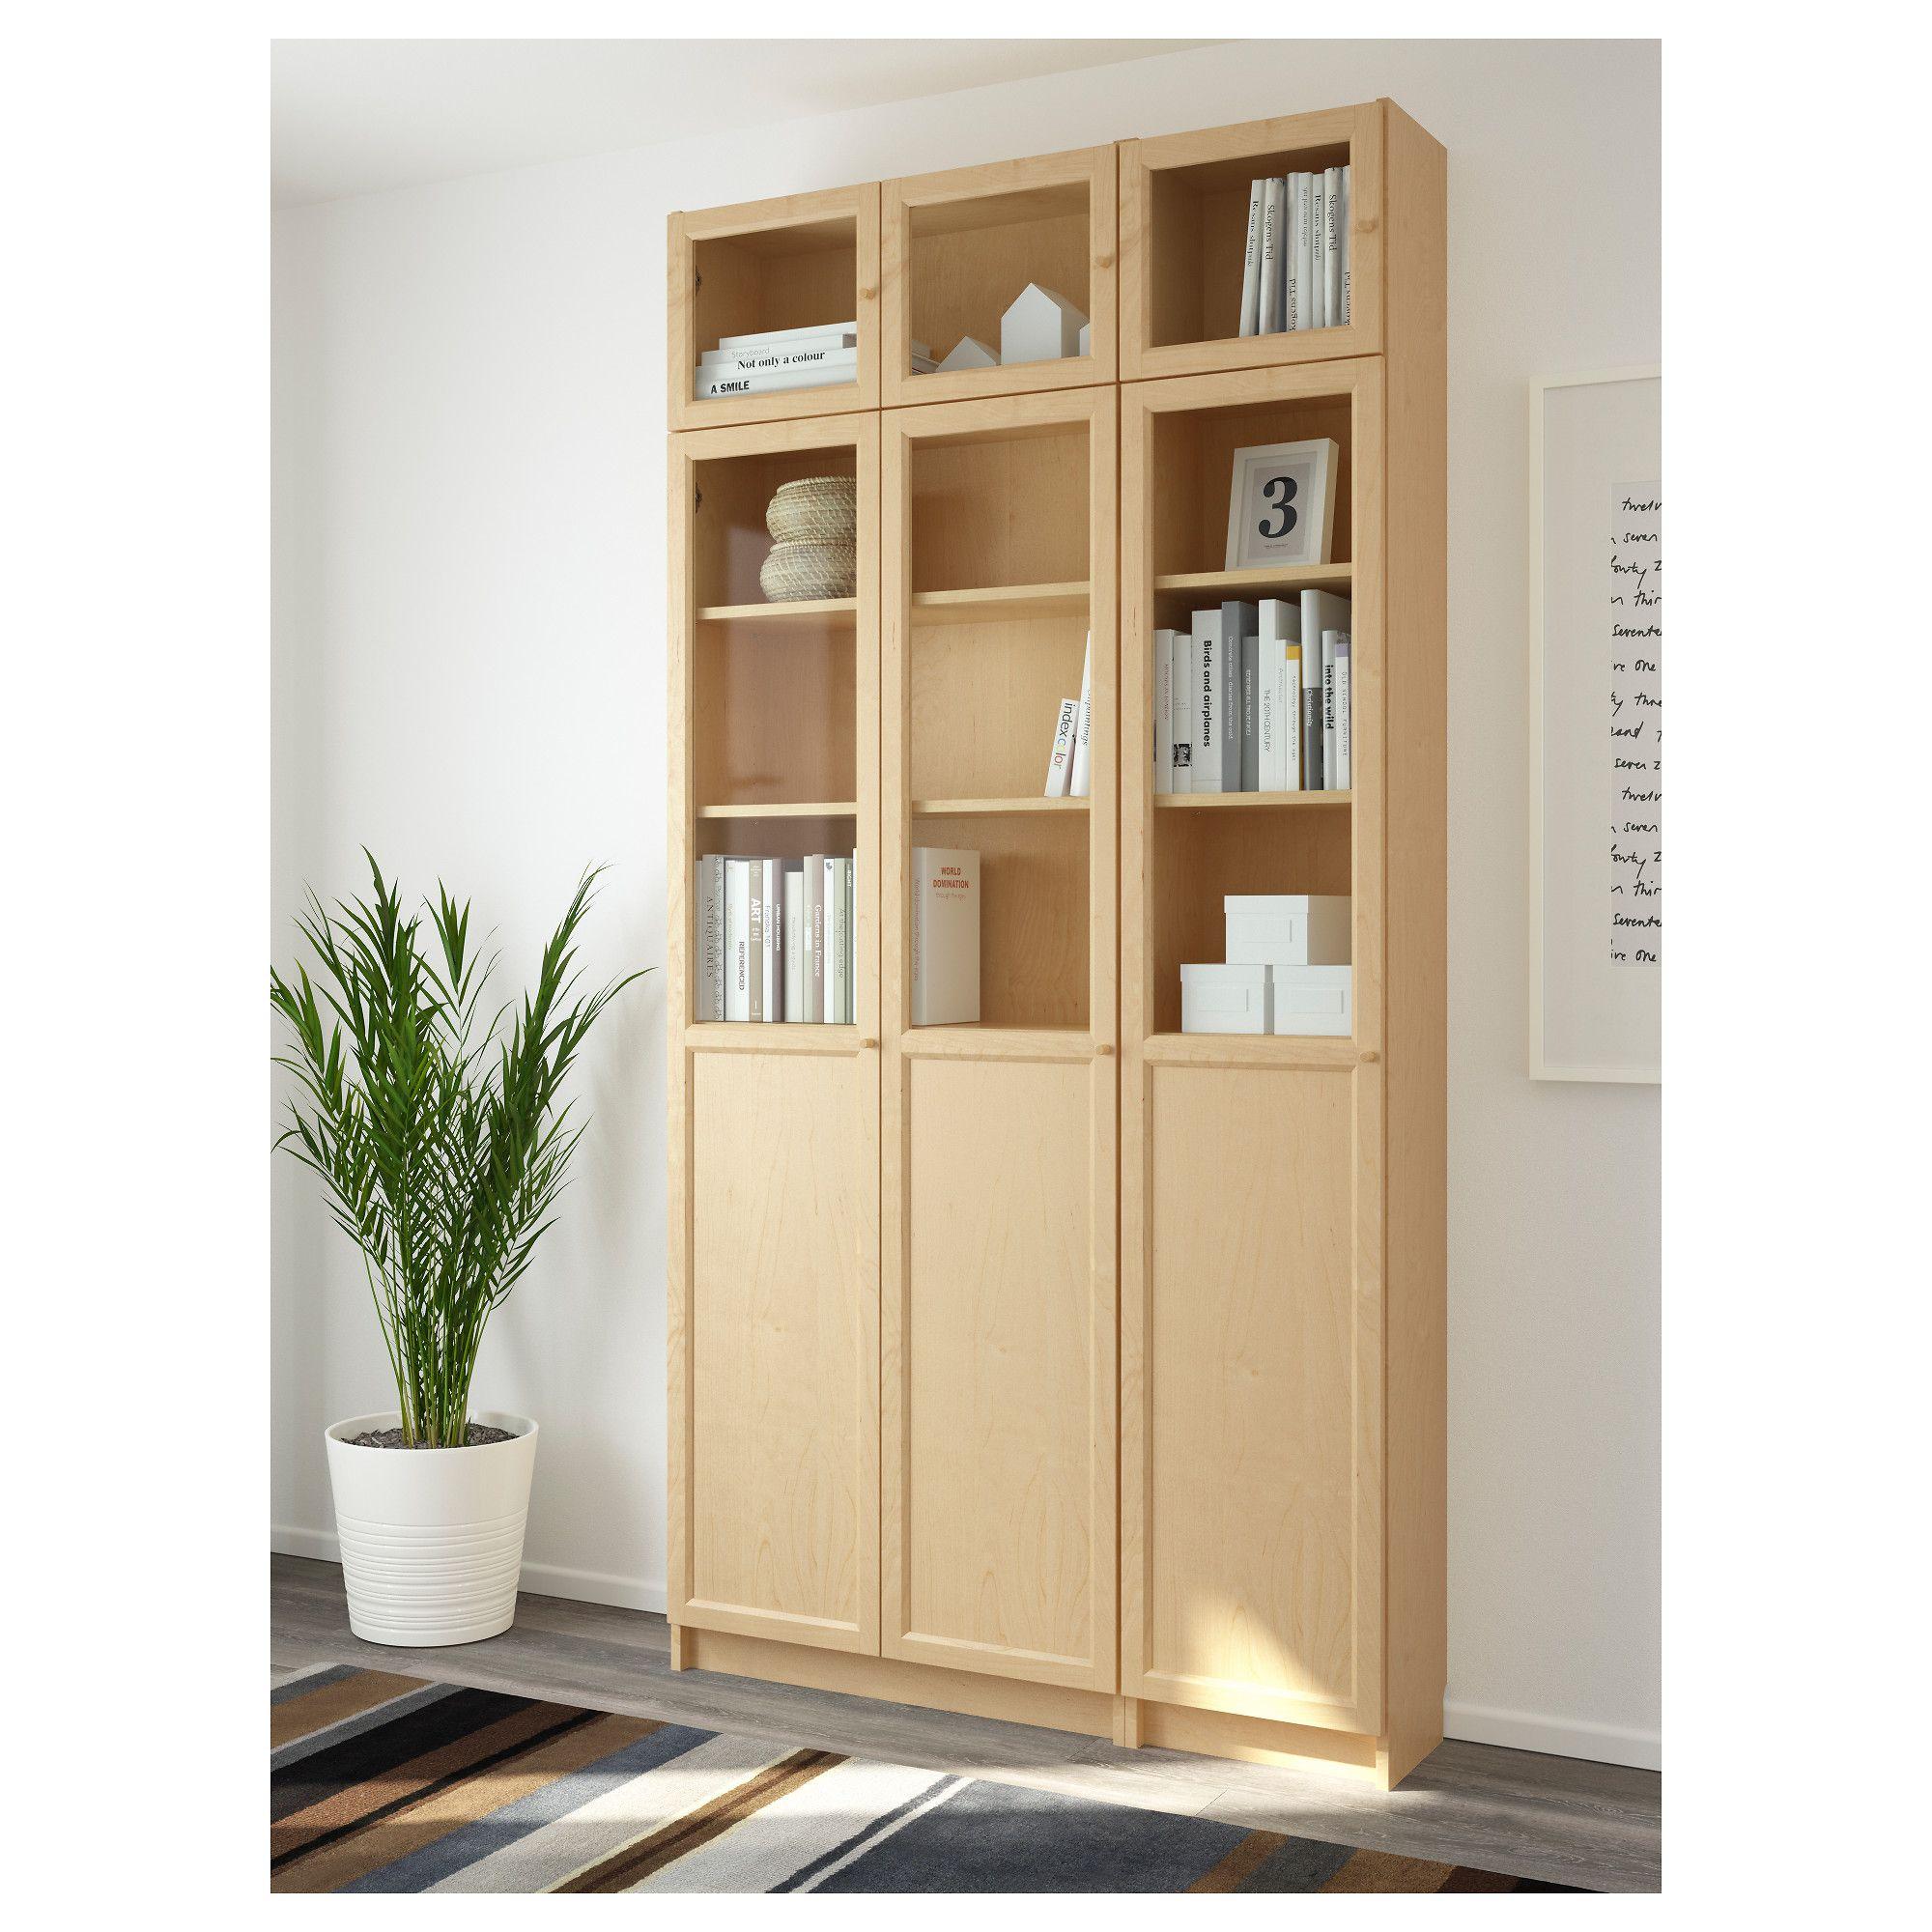 IKEA - BILLY / OXBERG Bookcase birch veneer, glass ...